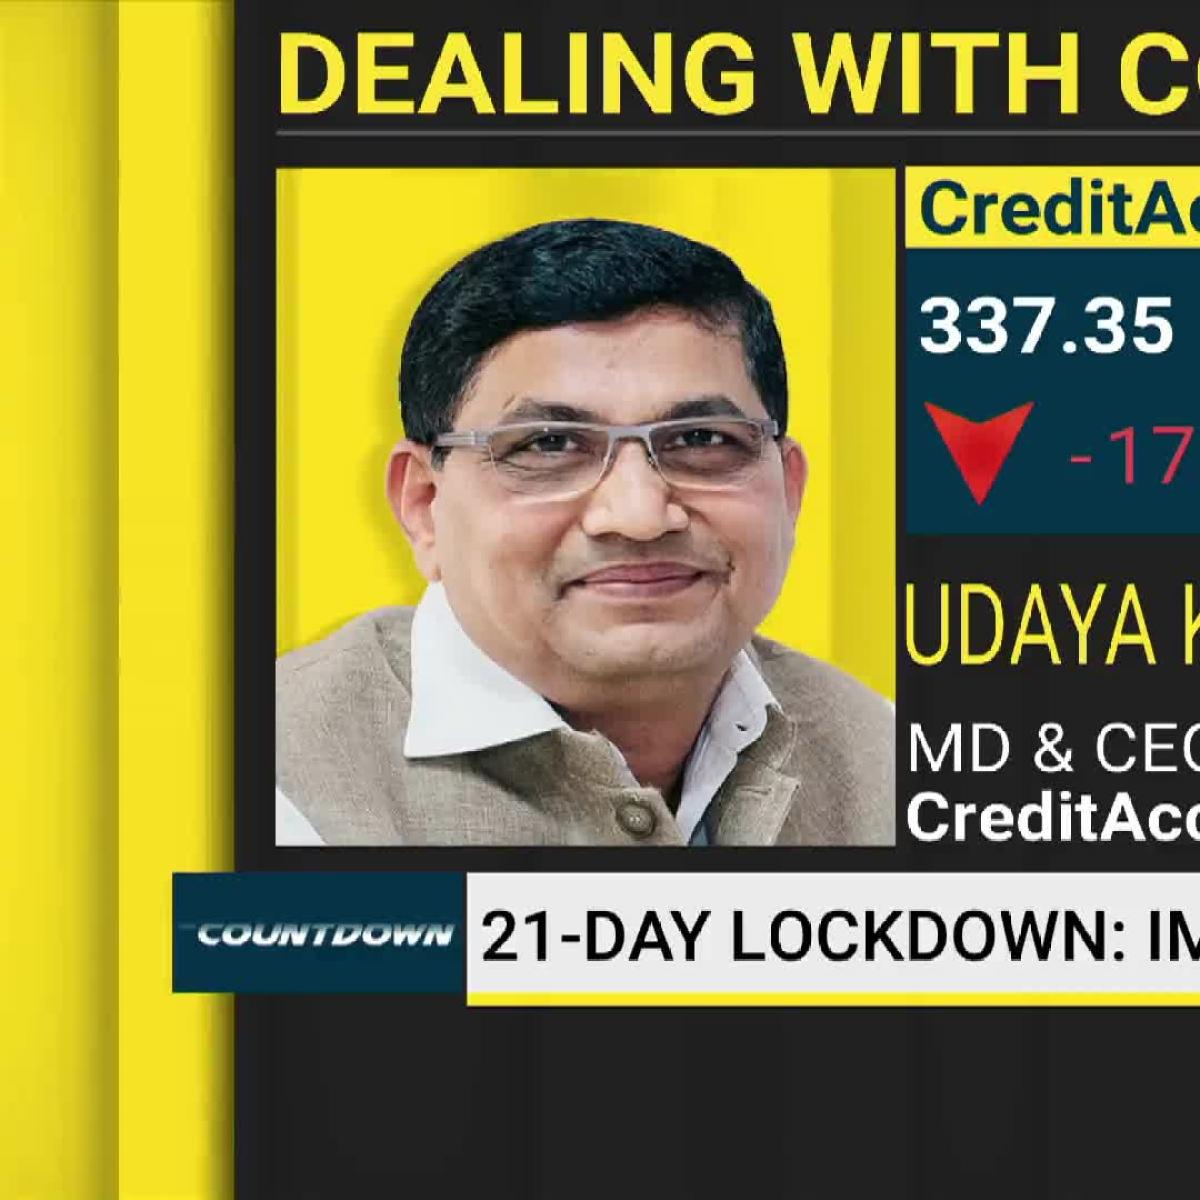 Long-Term Loans Keep CreditAccess Grameen's Liquidity High Through The Lockdown